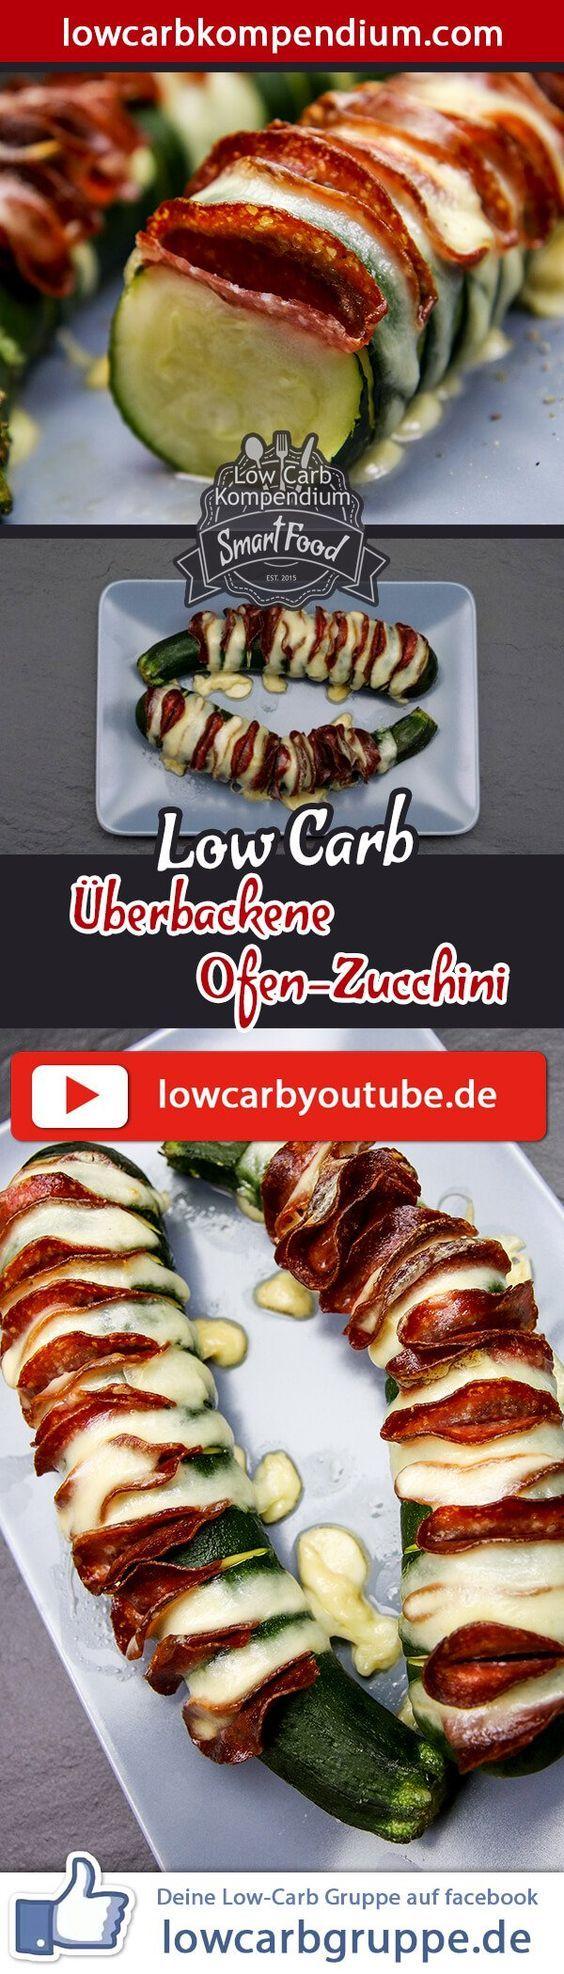 berbackene ofen zucchini low carb knuspriger snack low carb hauptgerichte pinterest. Black Bedroom Furniture Sets. Home Design Ideas